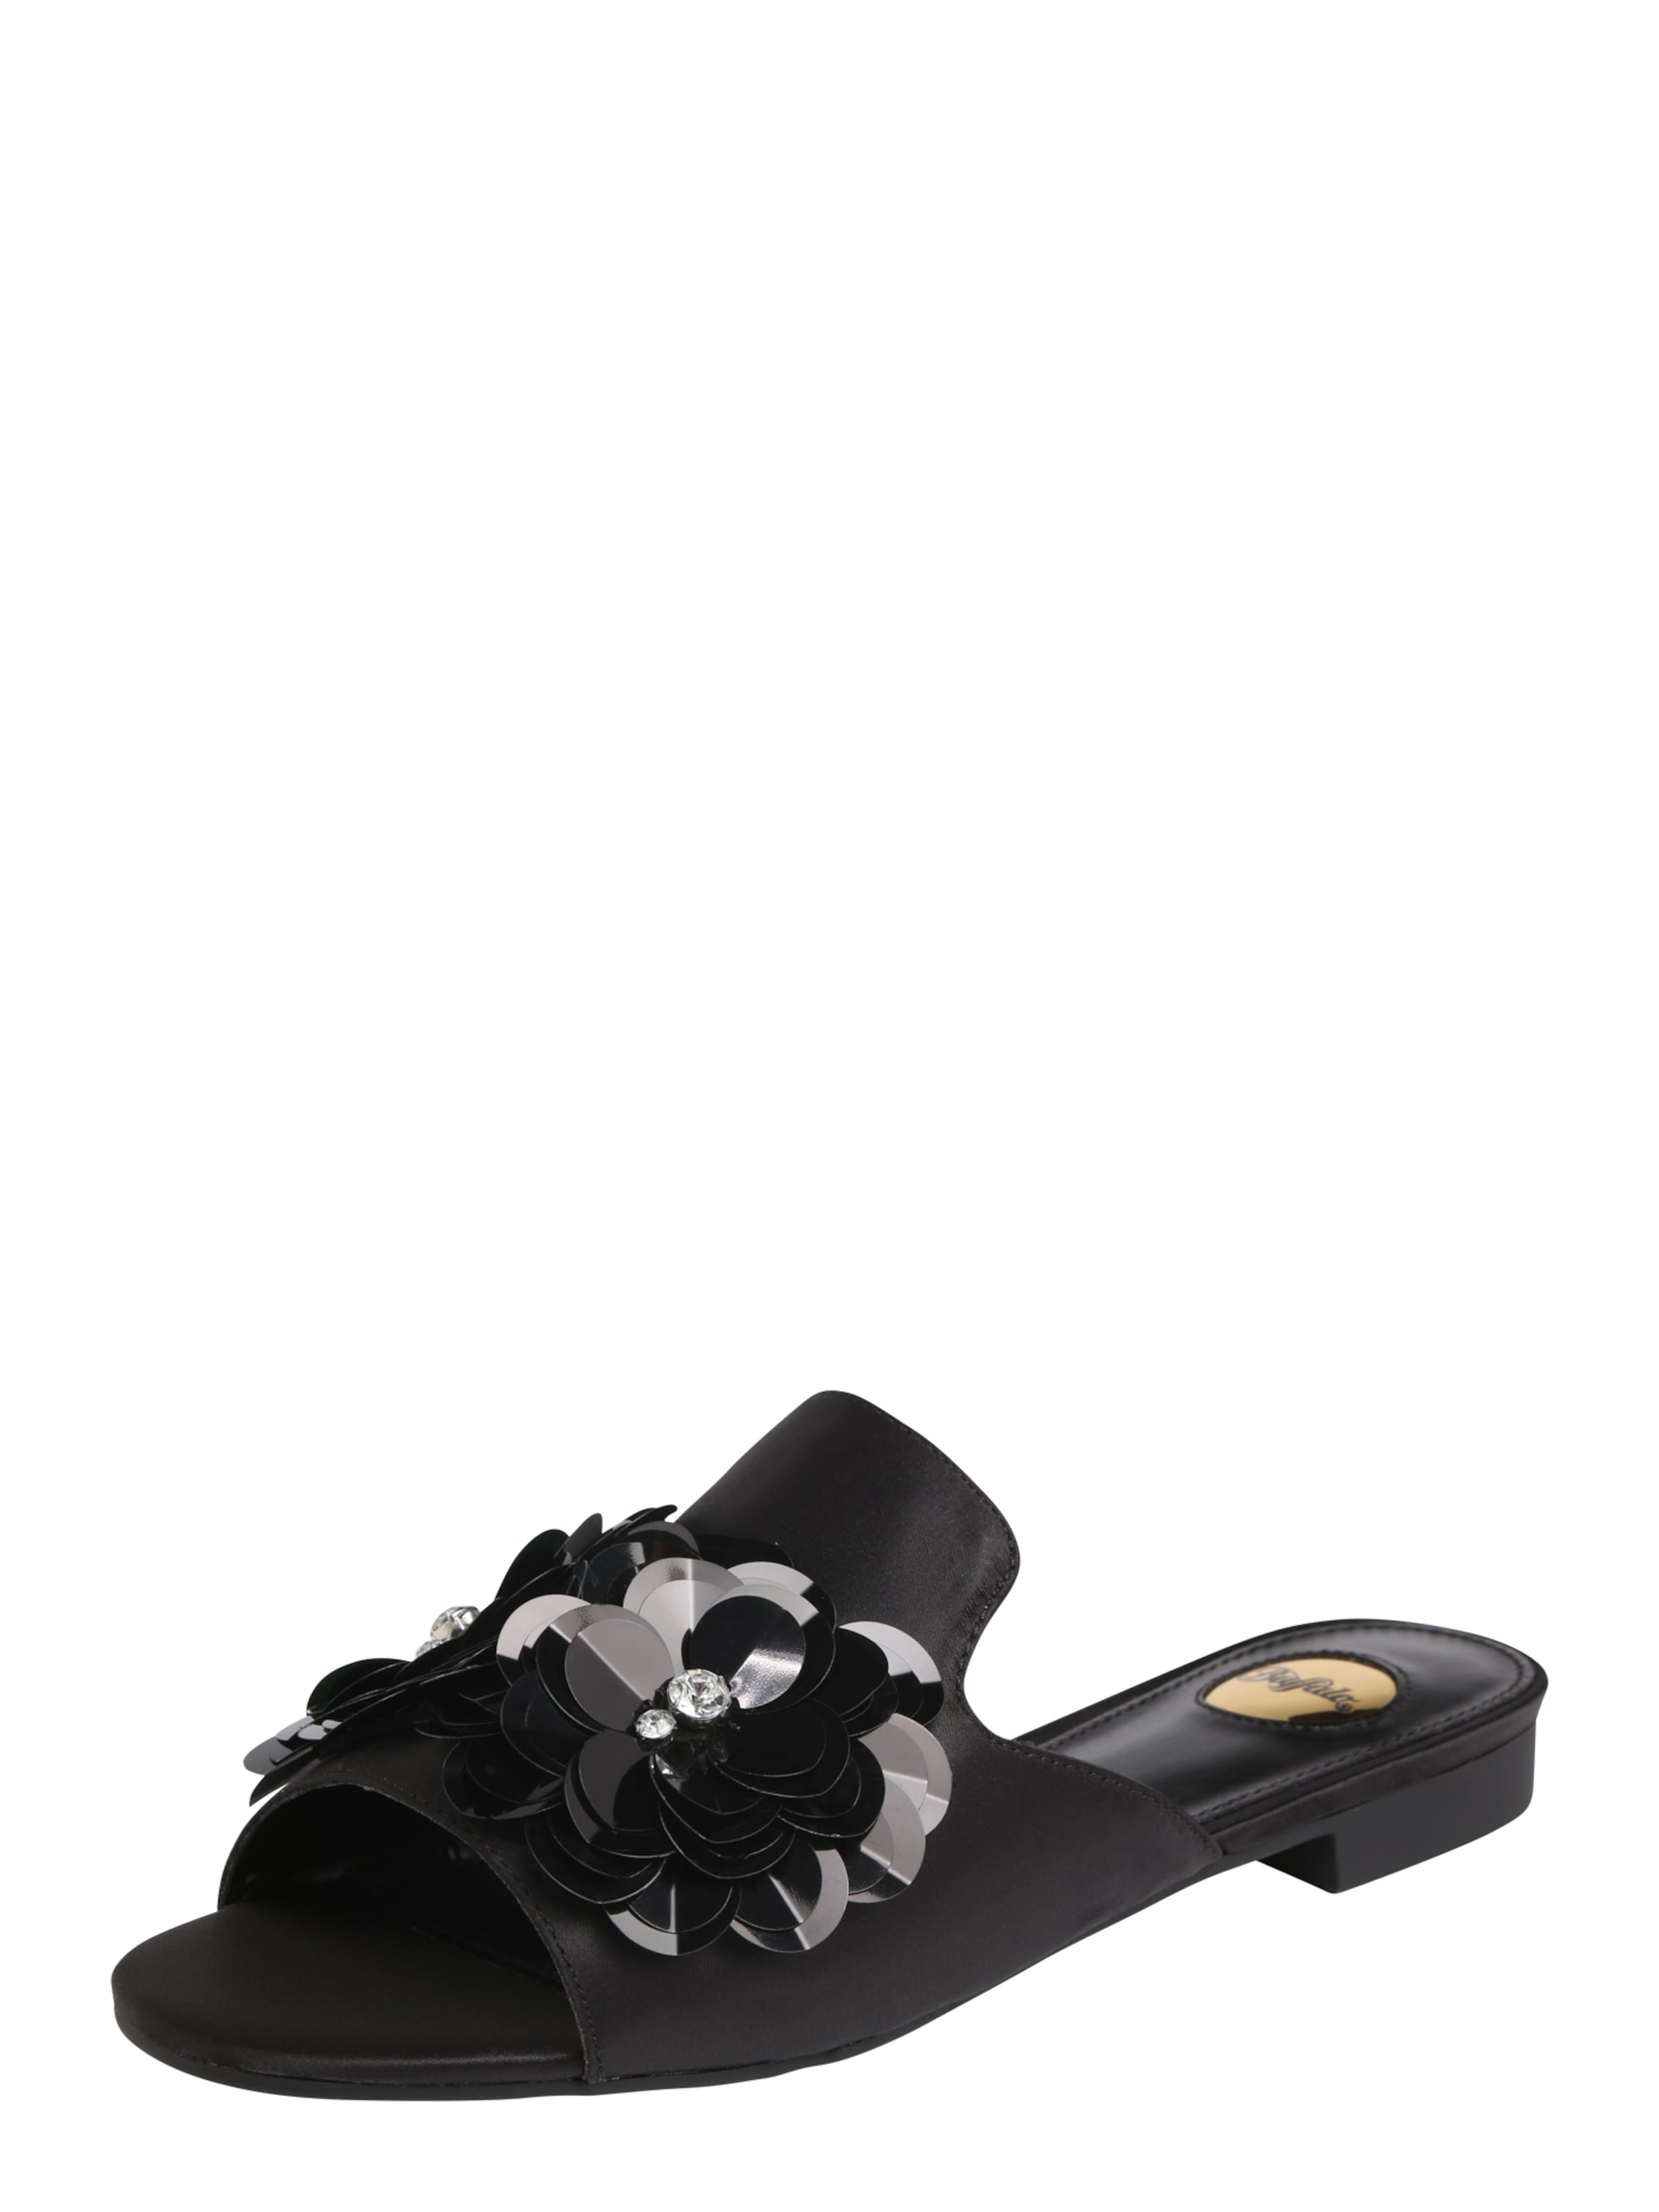 BUFFALO Pantolette Verschleißfeste billige Schuhe Hohe Qualität